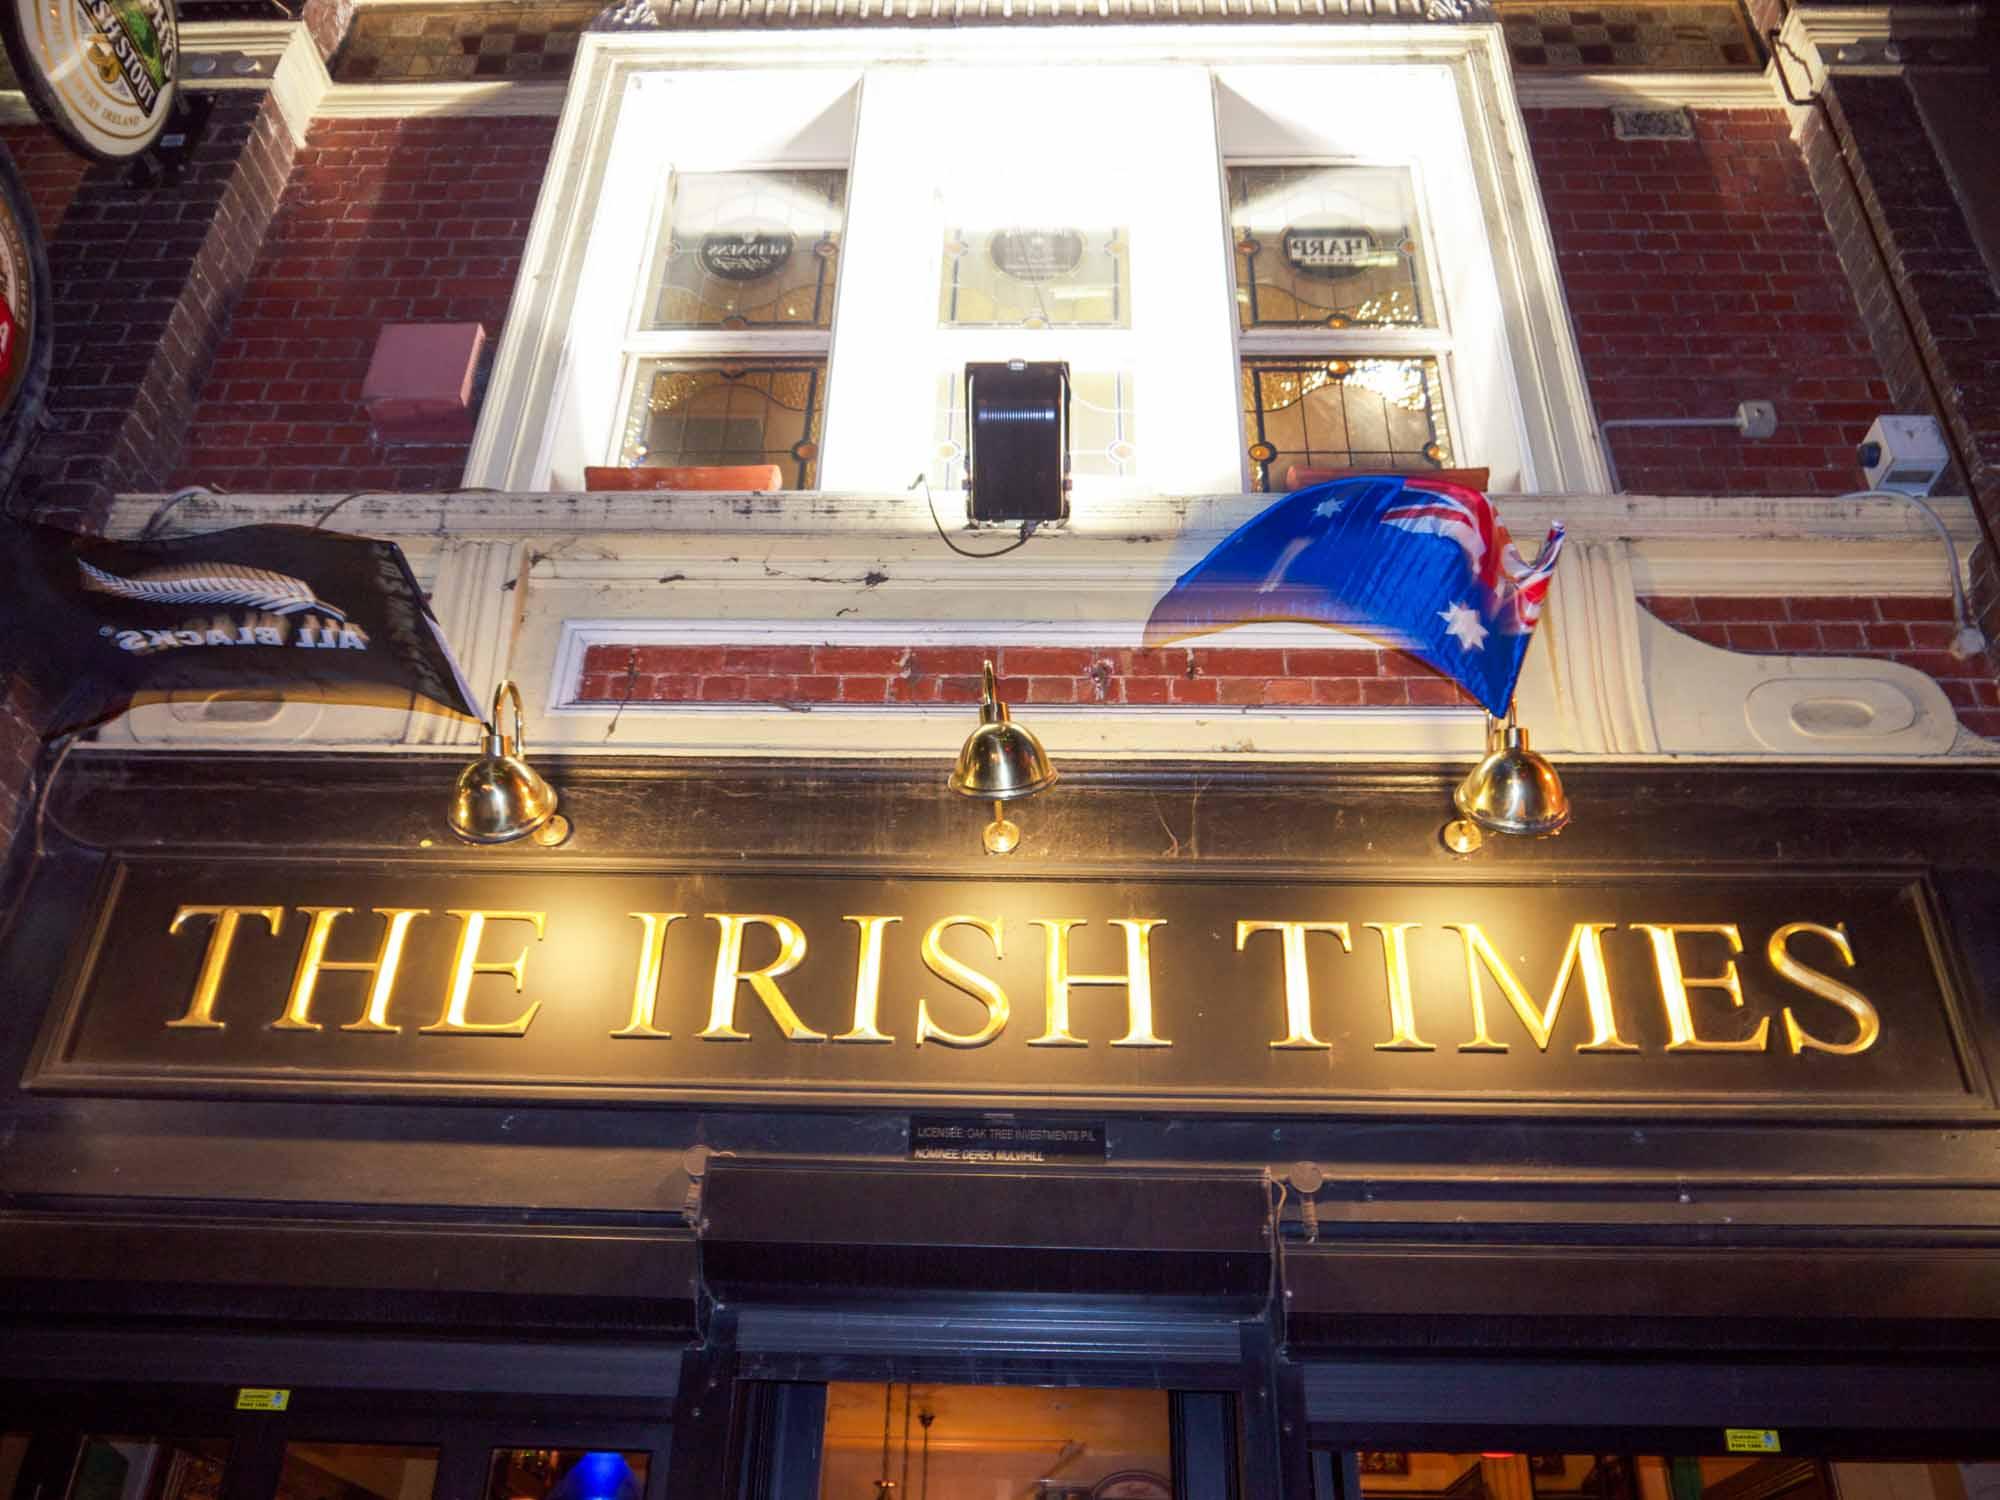 IrishTimesImages-34-of-39